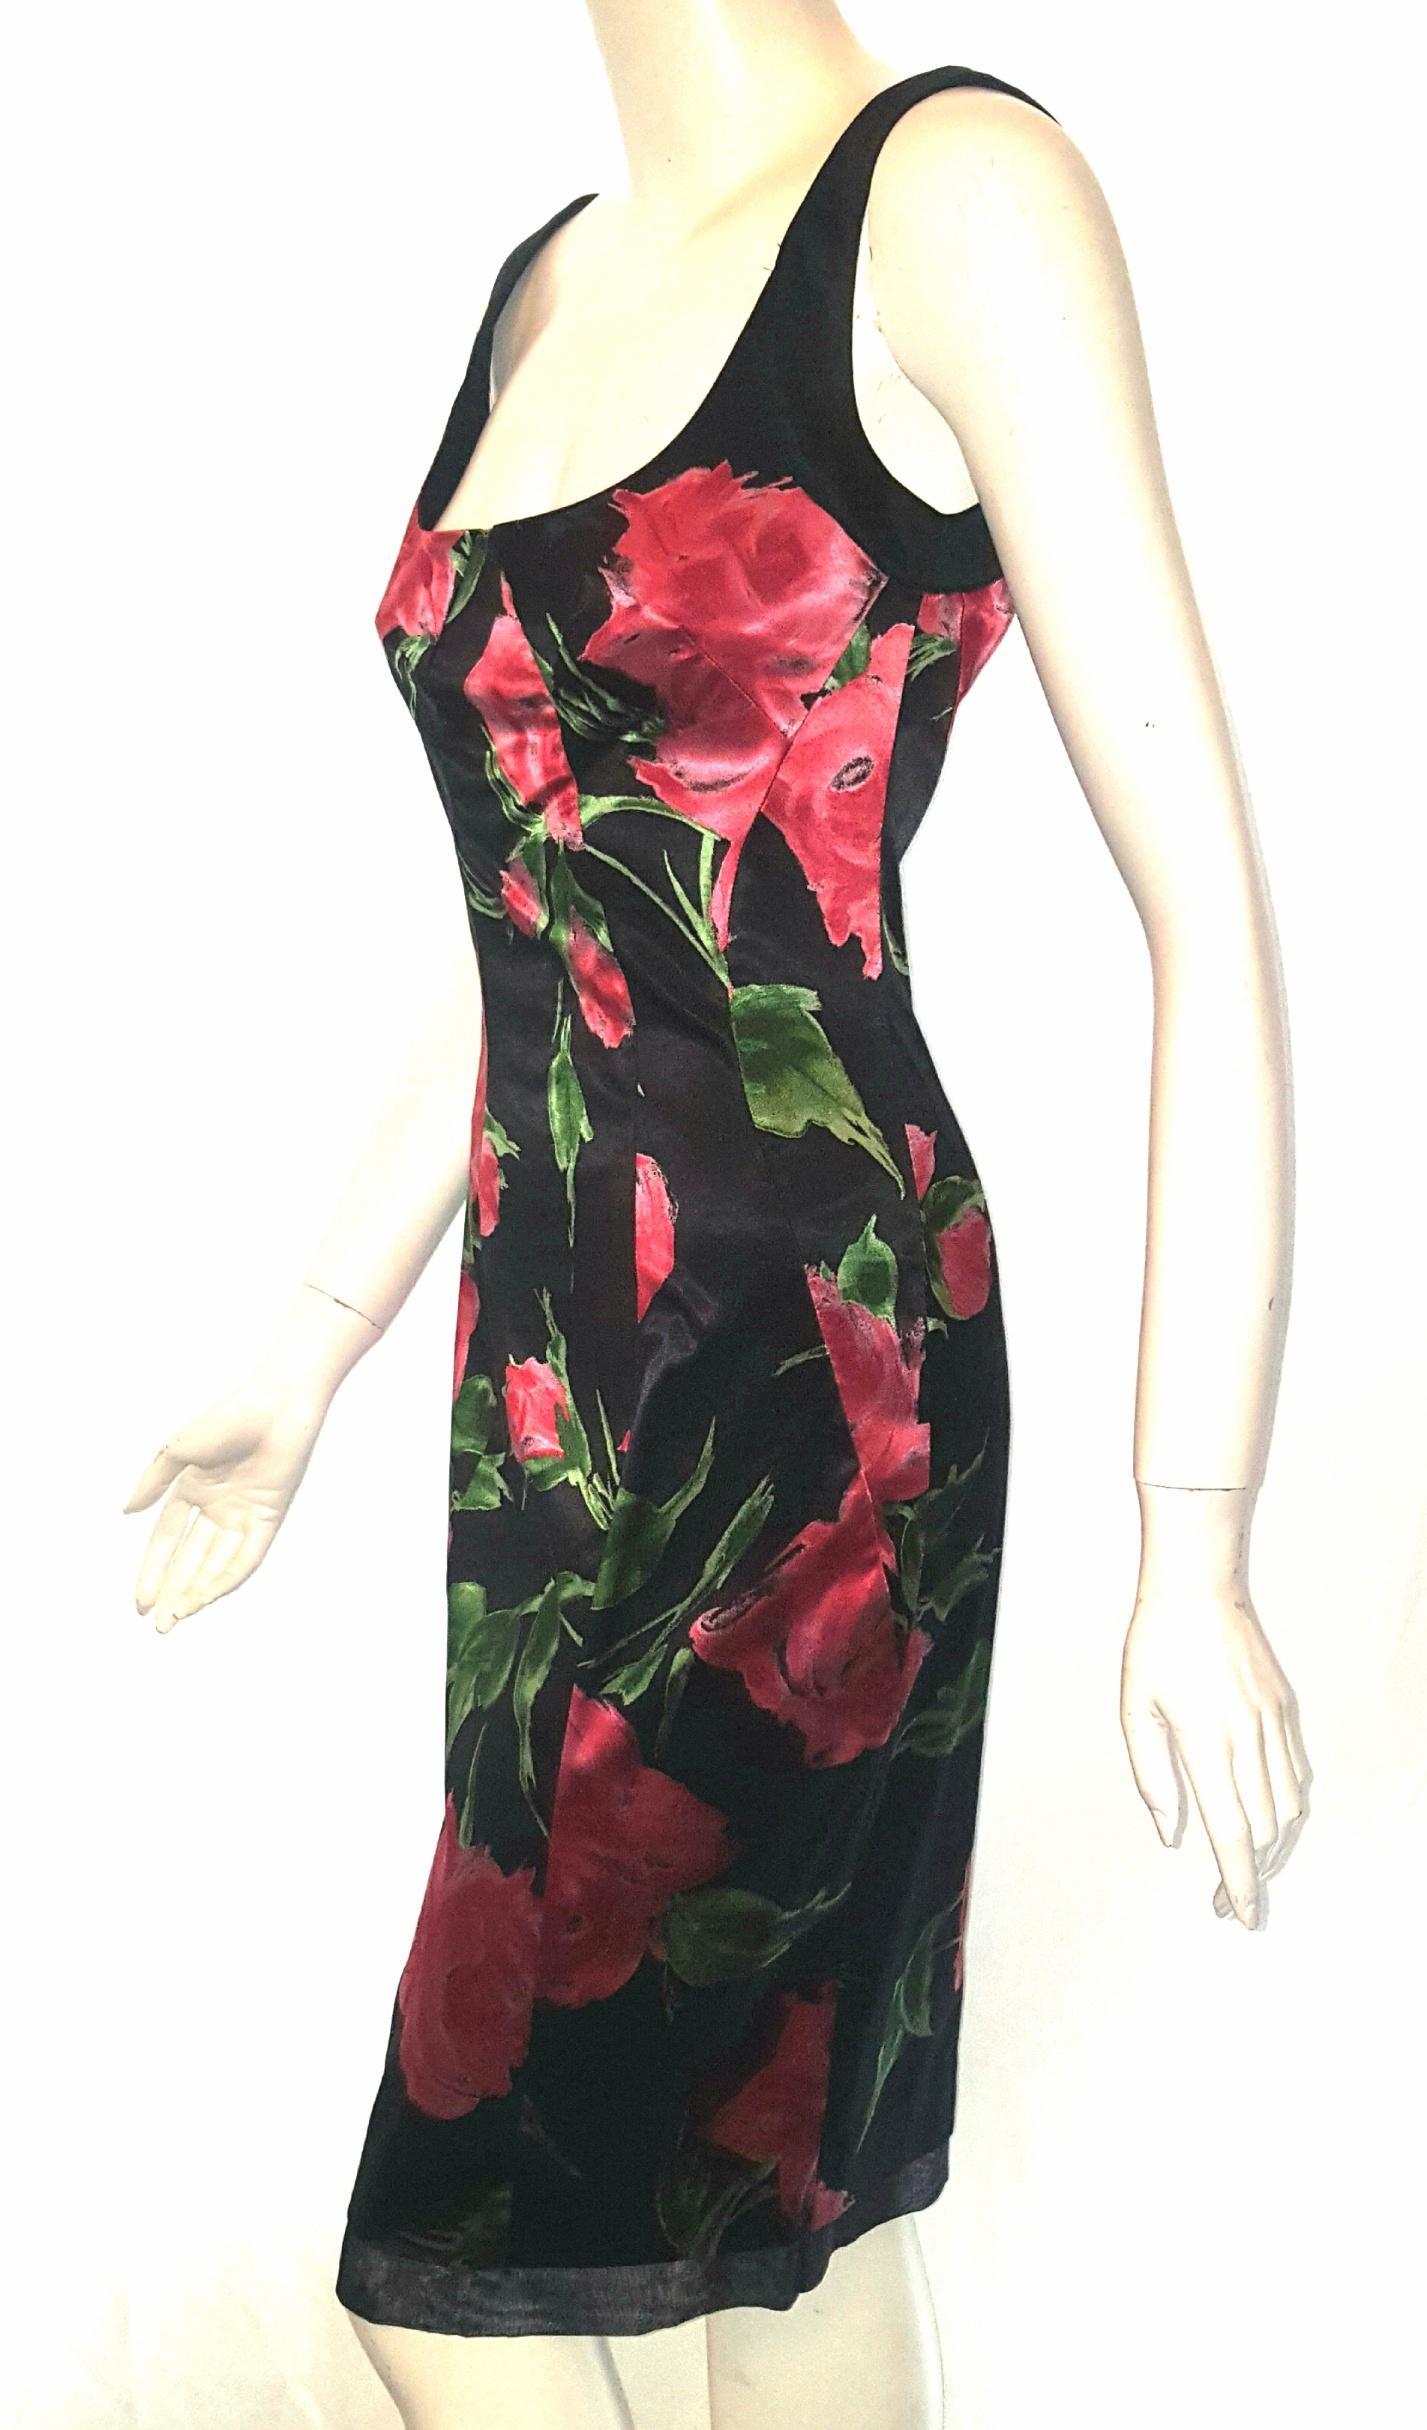 Satin Sleeveless Dress